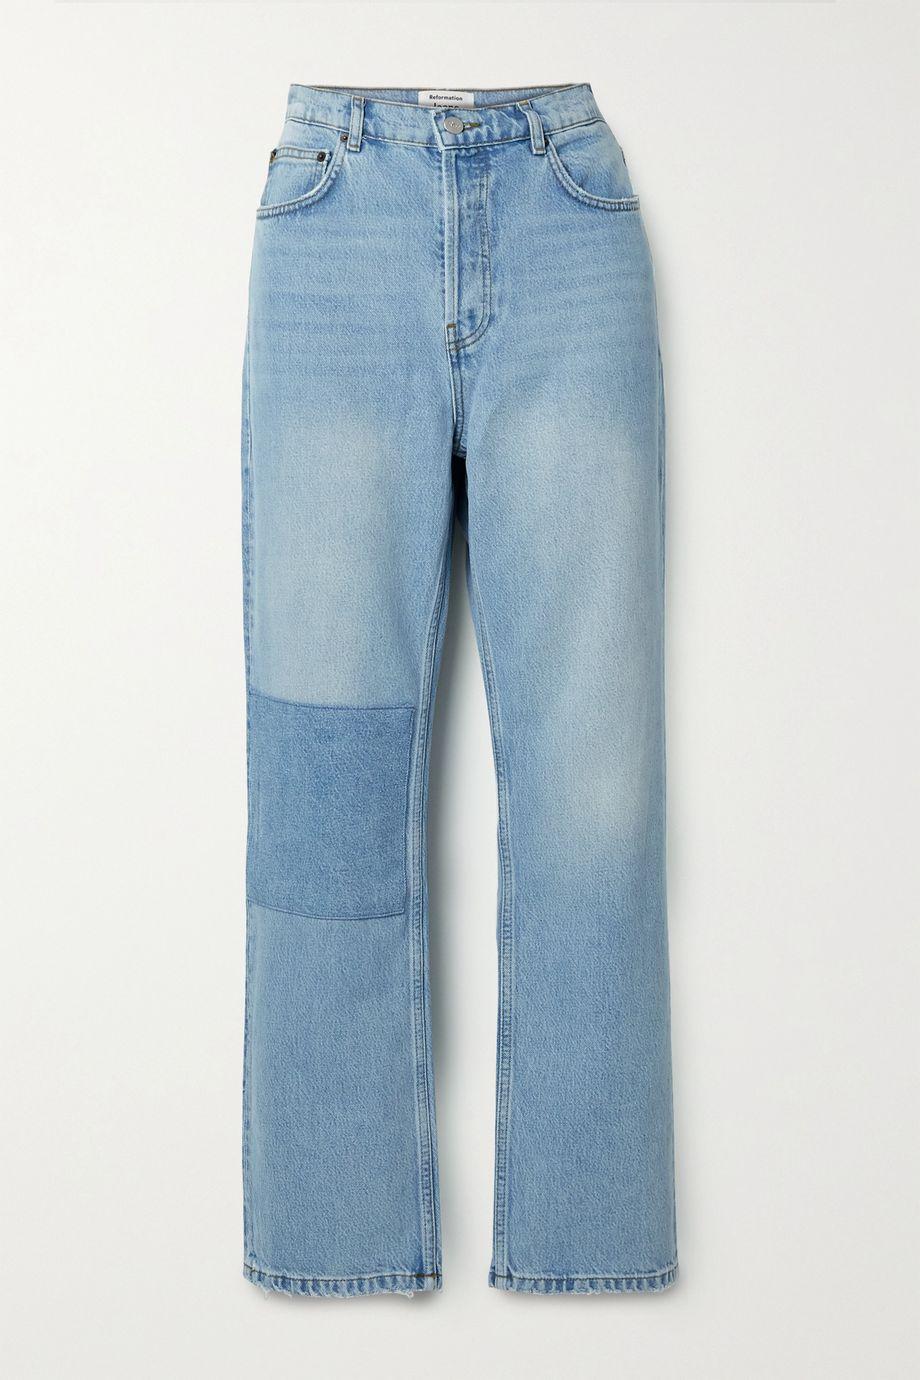 Reformation Patch Cynthia organic high-rise straight-leg jeans